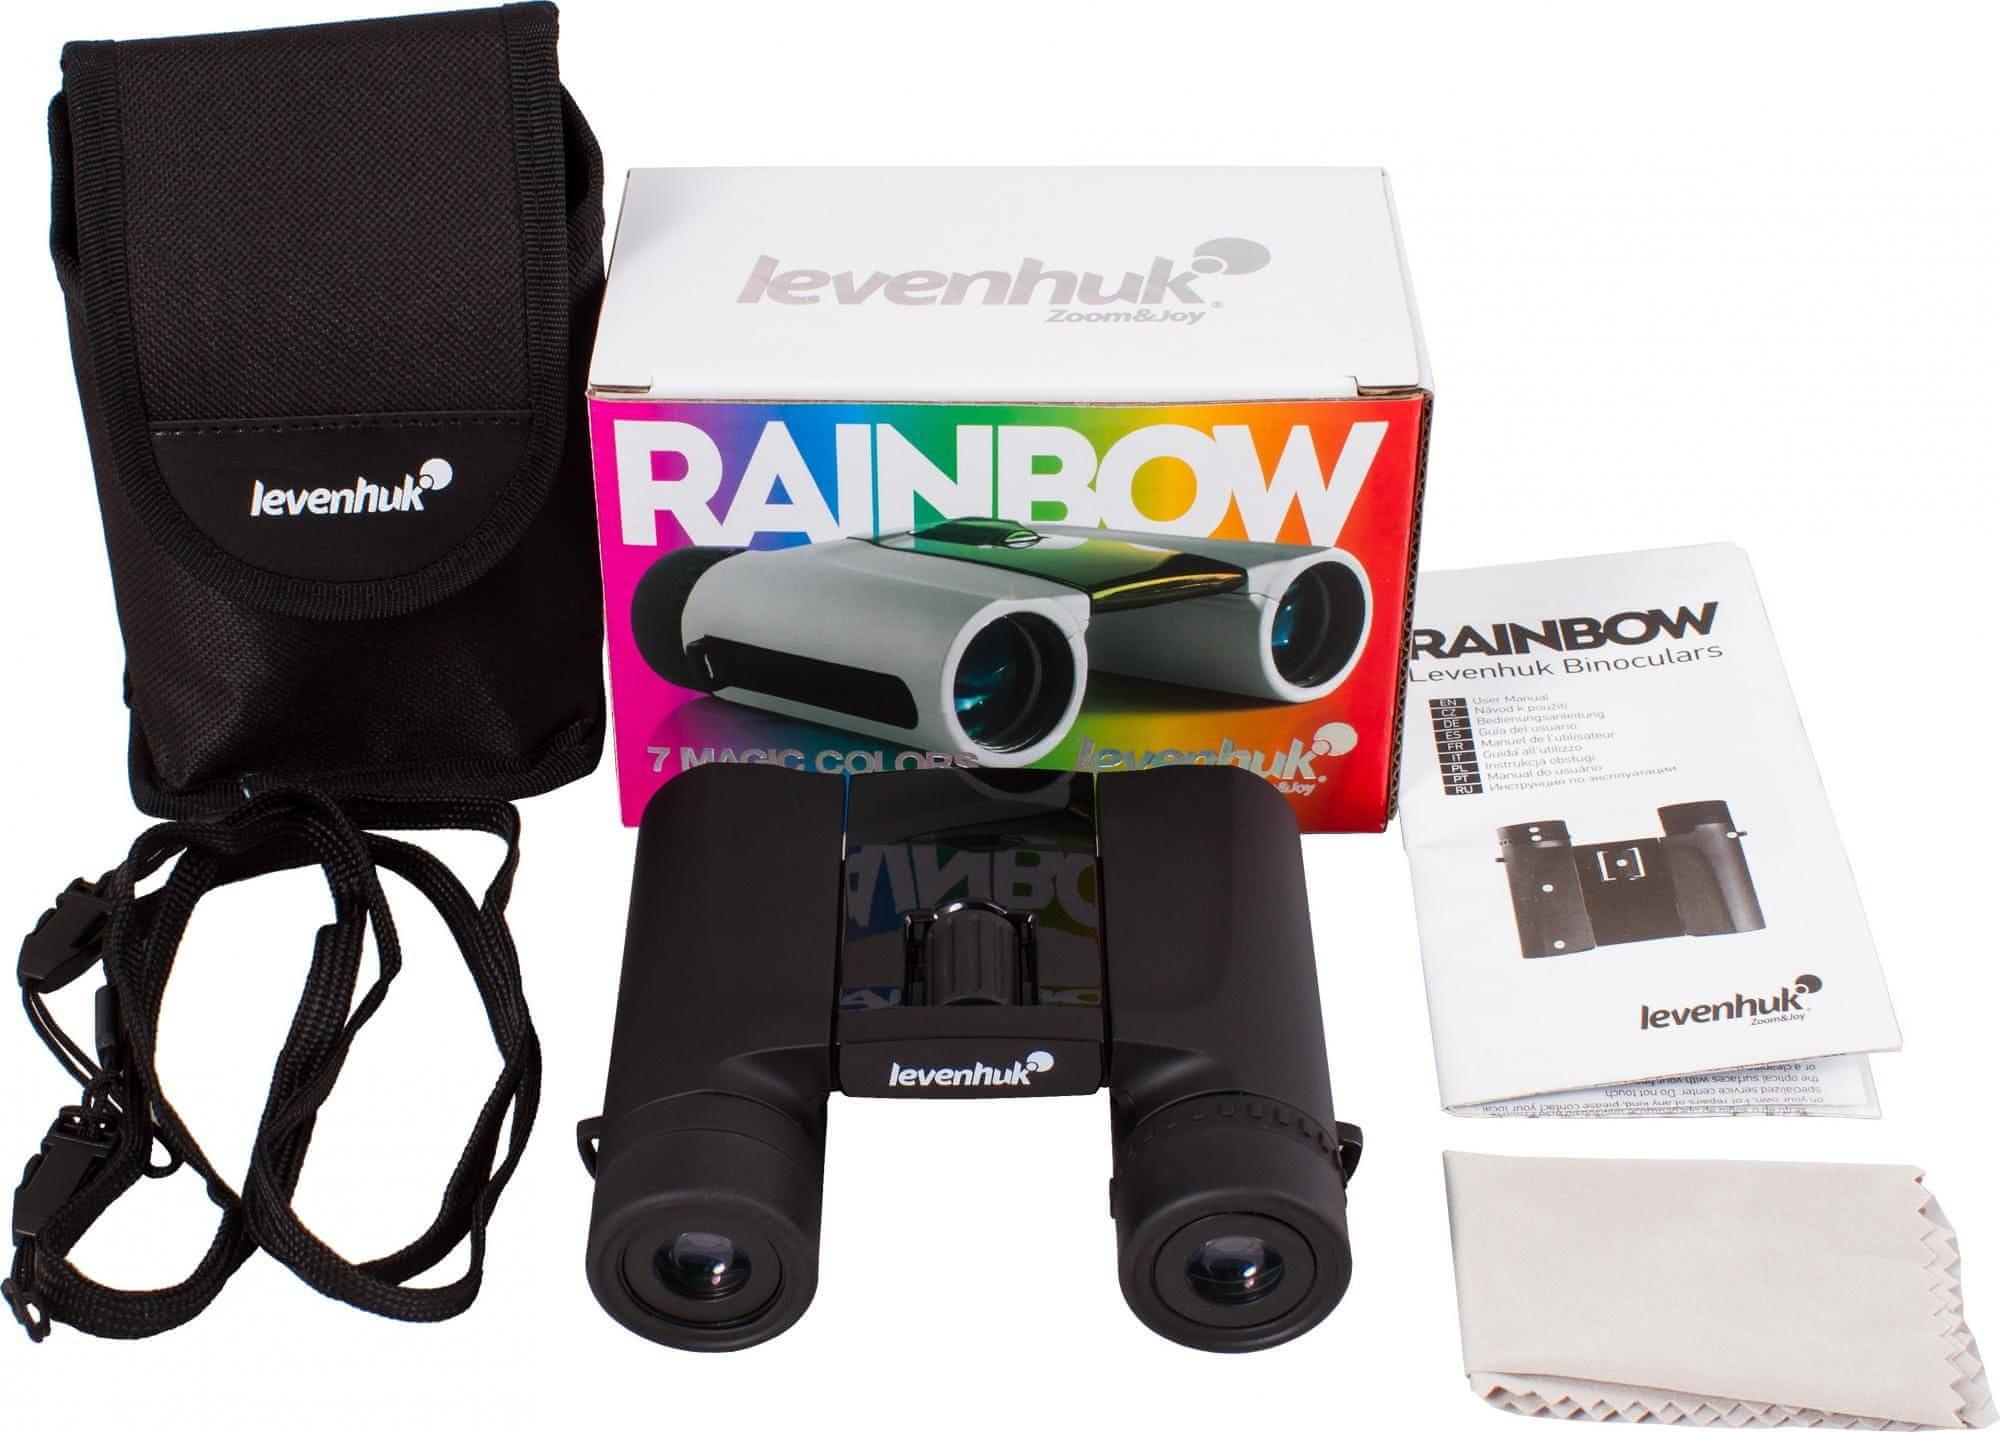 Levenhuk Rainbow 8x25